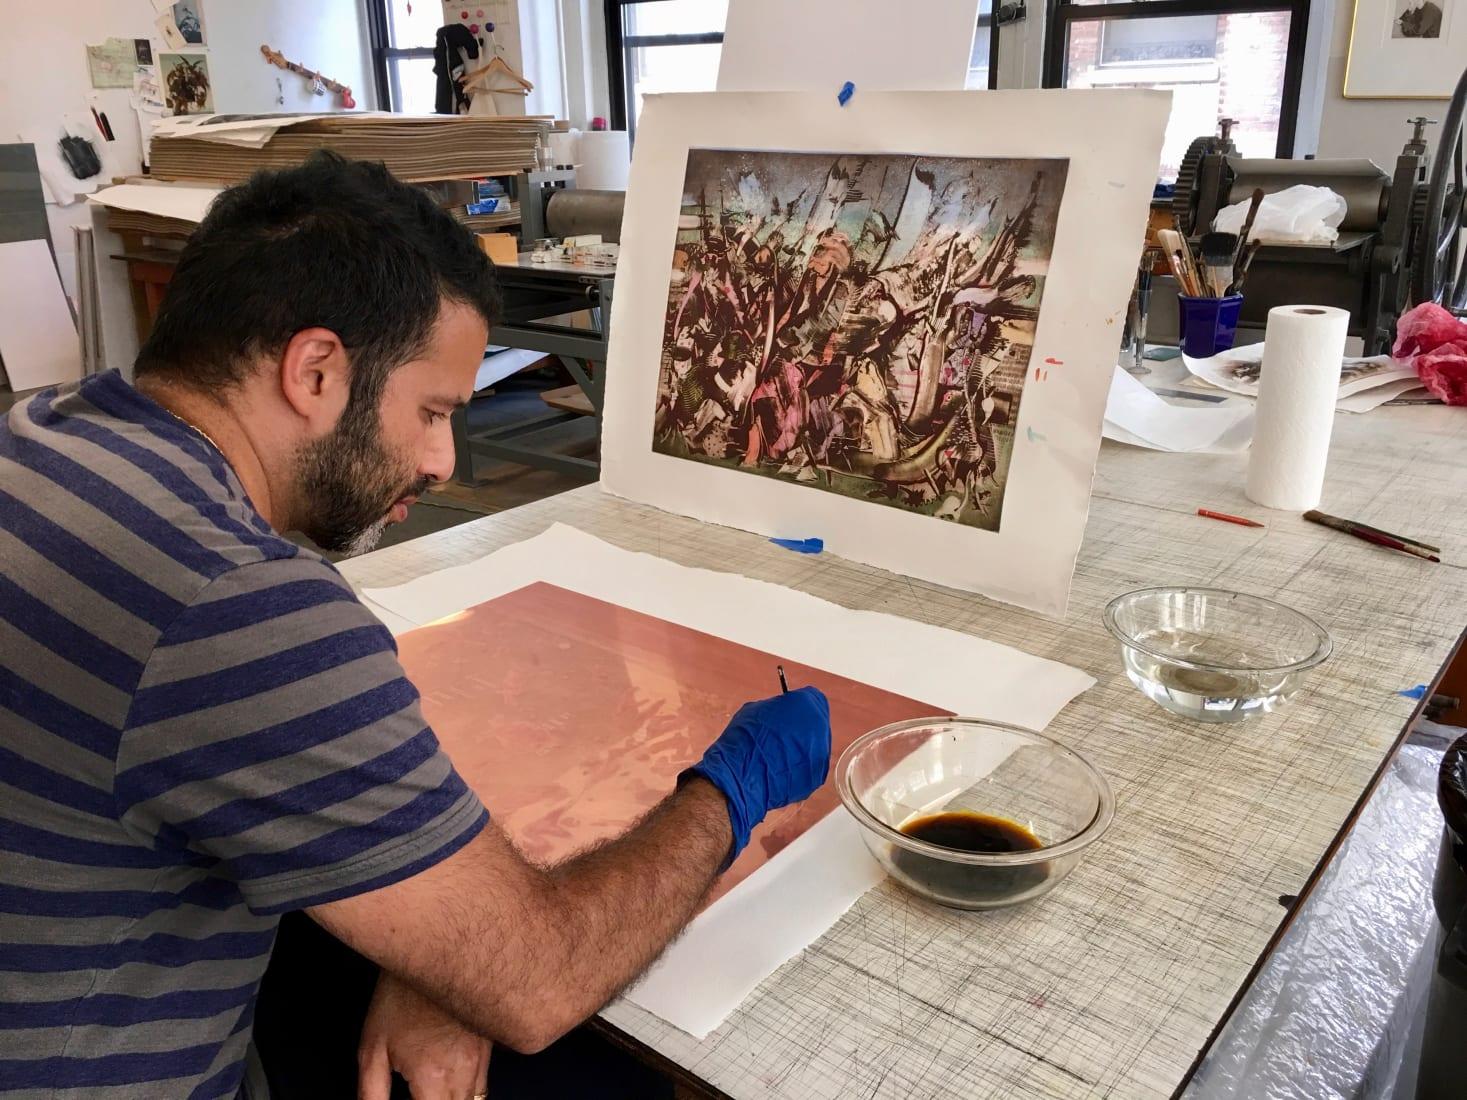 <p><span>Ali Banisadr working on plates at Burnet Editions, New York, 2019. Photo: Greg Burnet.</span></p>